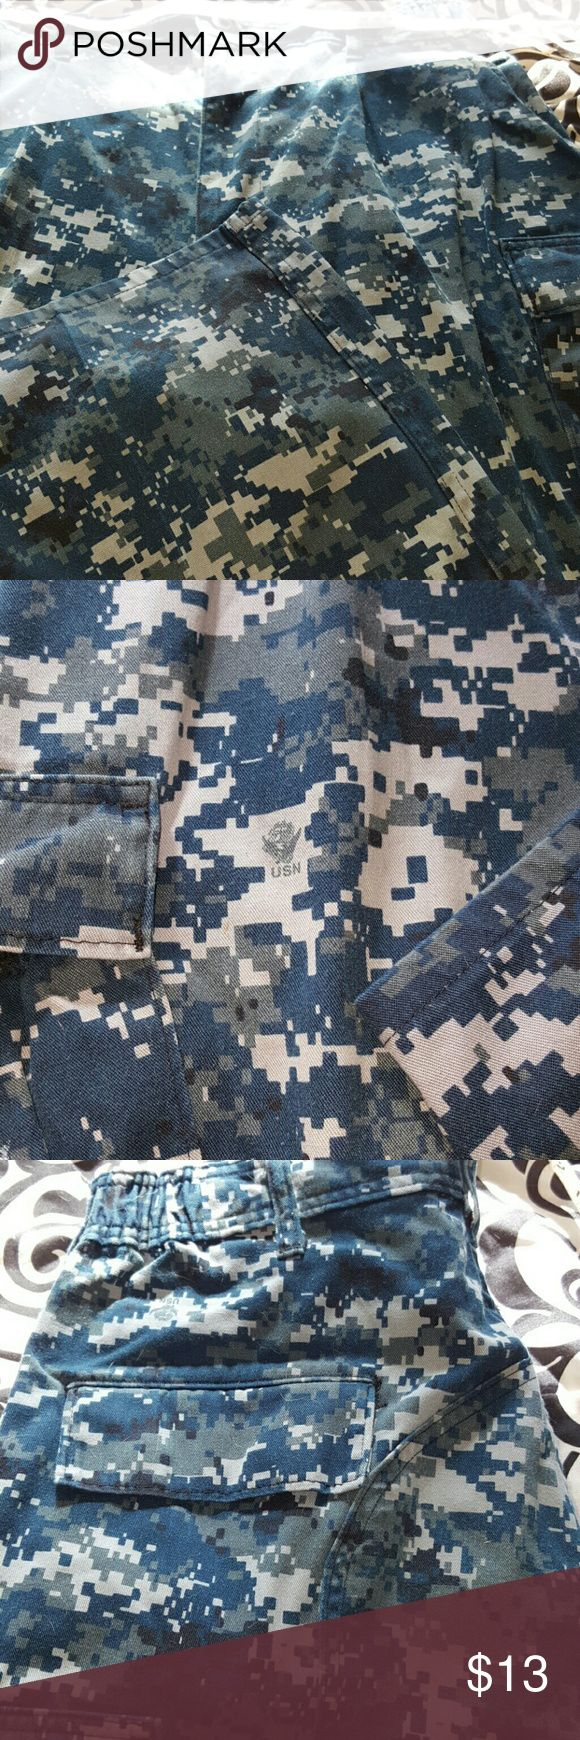 Navy Blue Camo Pants Original Navy uniform. Size medium, elastic bands on the sides. Excellent condition. Pants